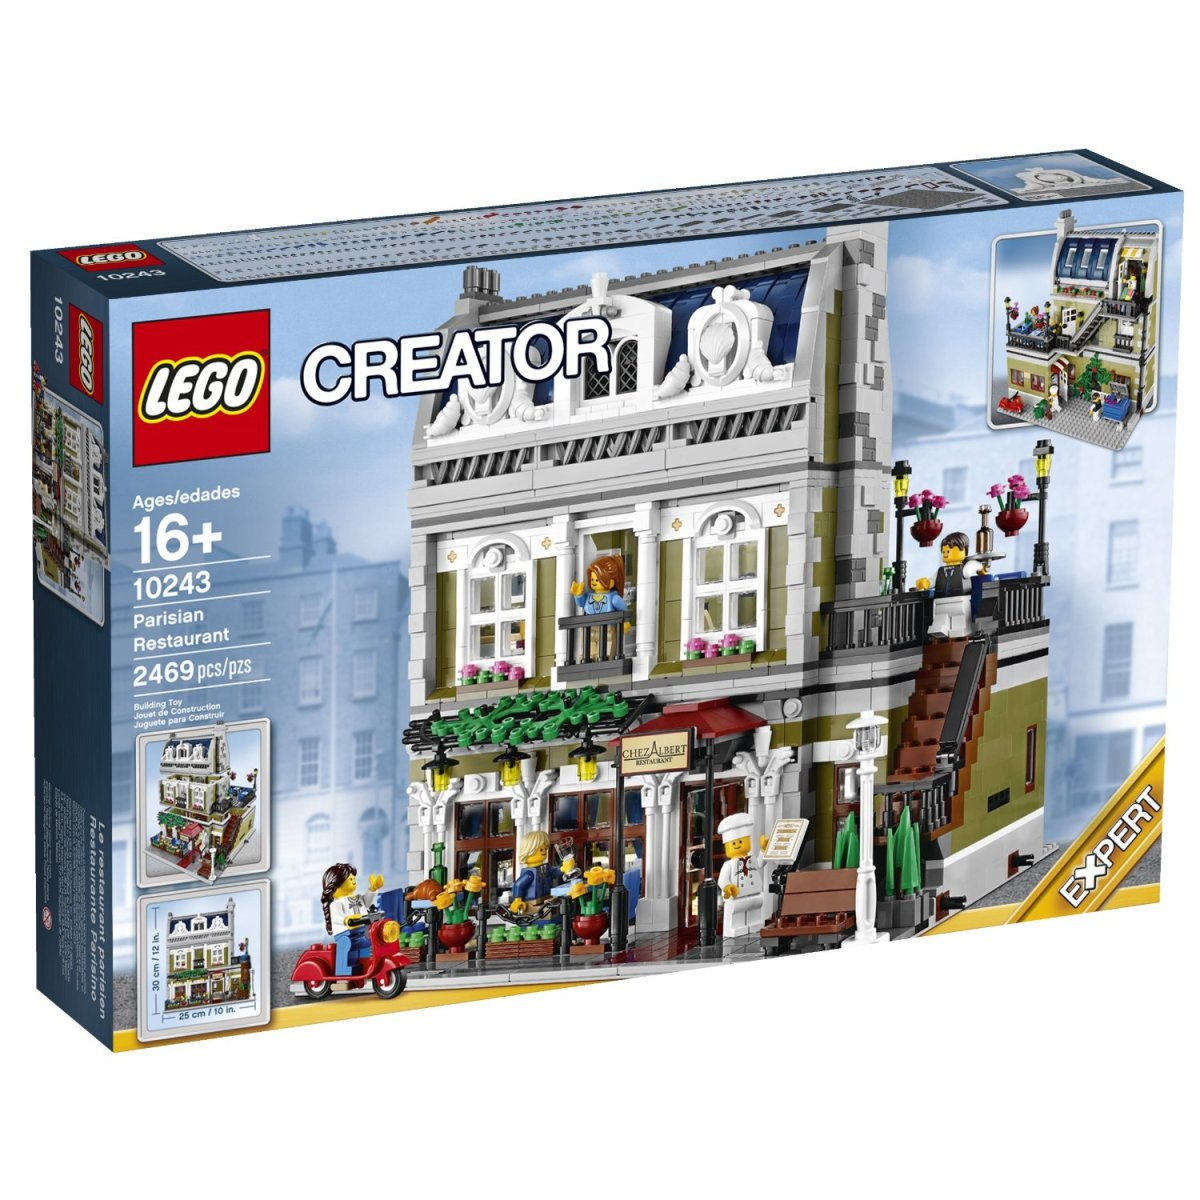 lego-creator-parisian-restaurant-10243-modular-buildings-series